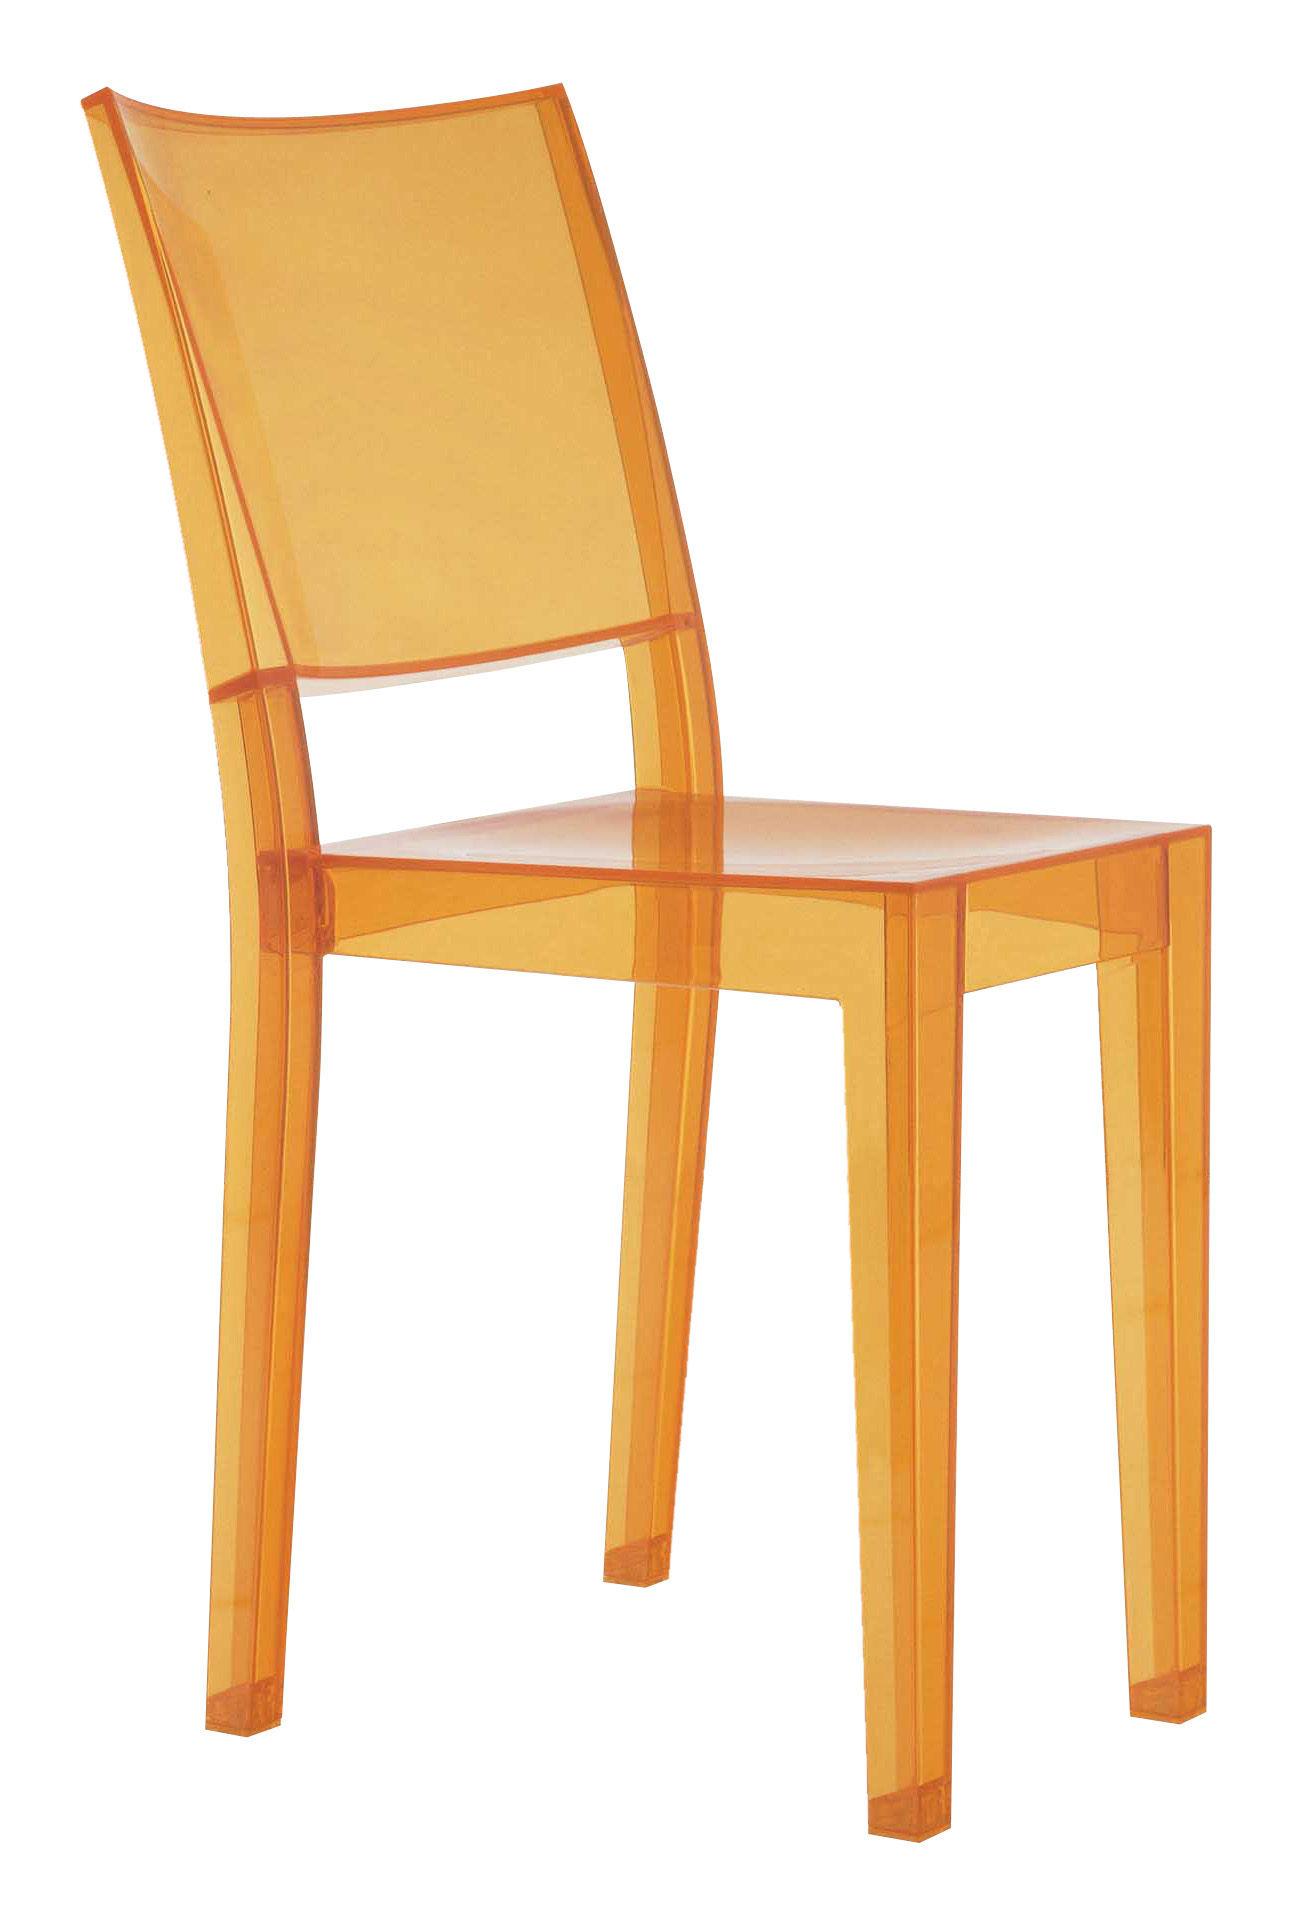 chaise empilable la marie polycarbonate orange clair kartell. Black Bedroom Furniture Sets. Home Design Ideas